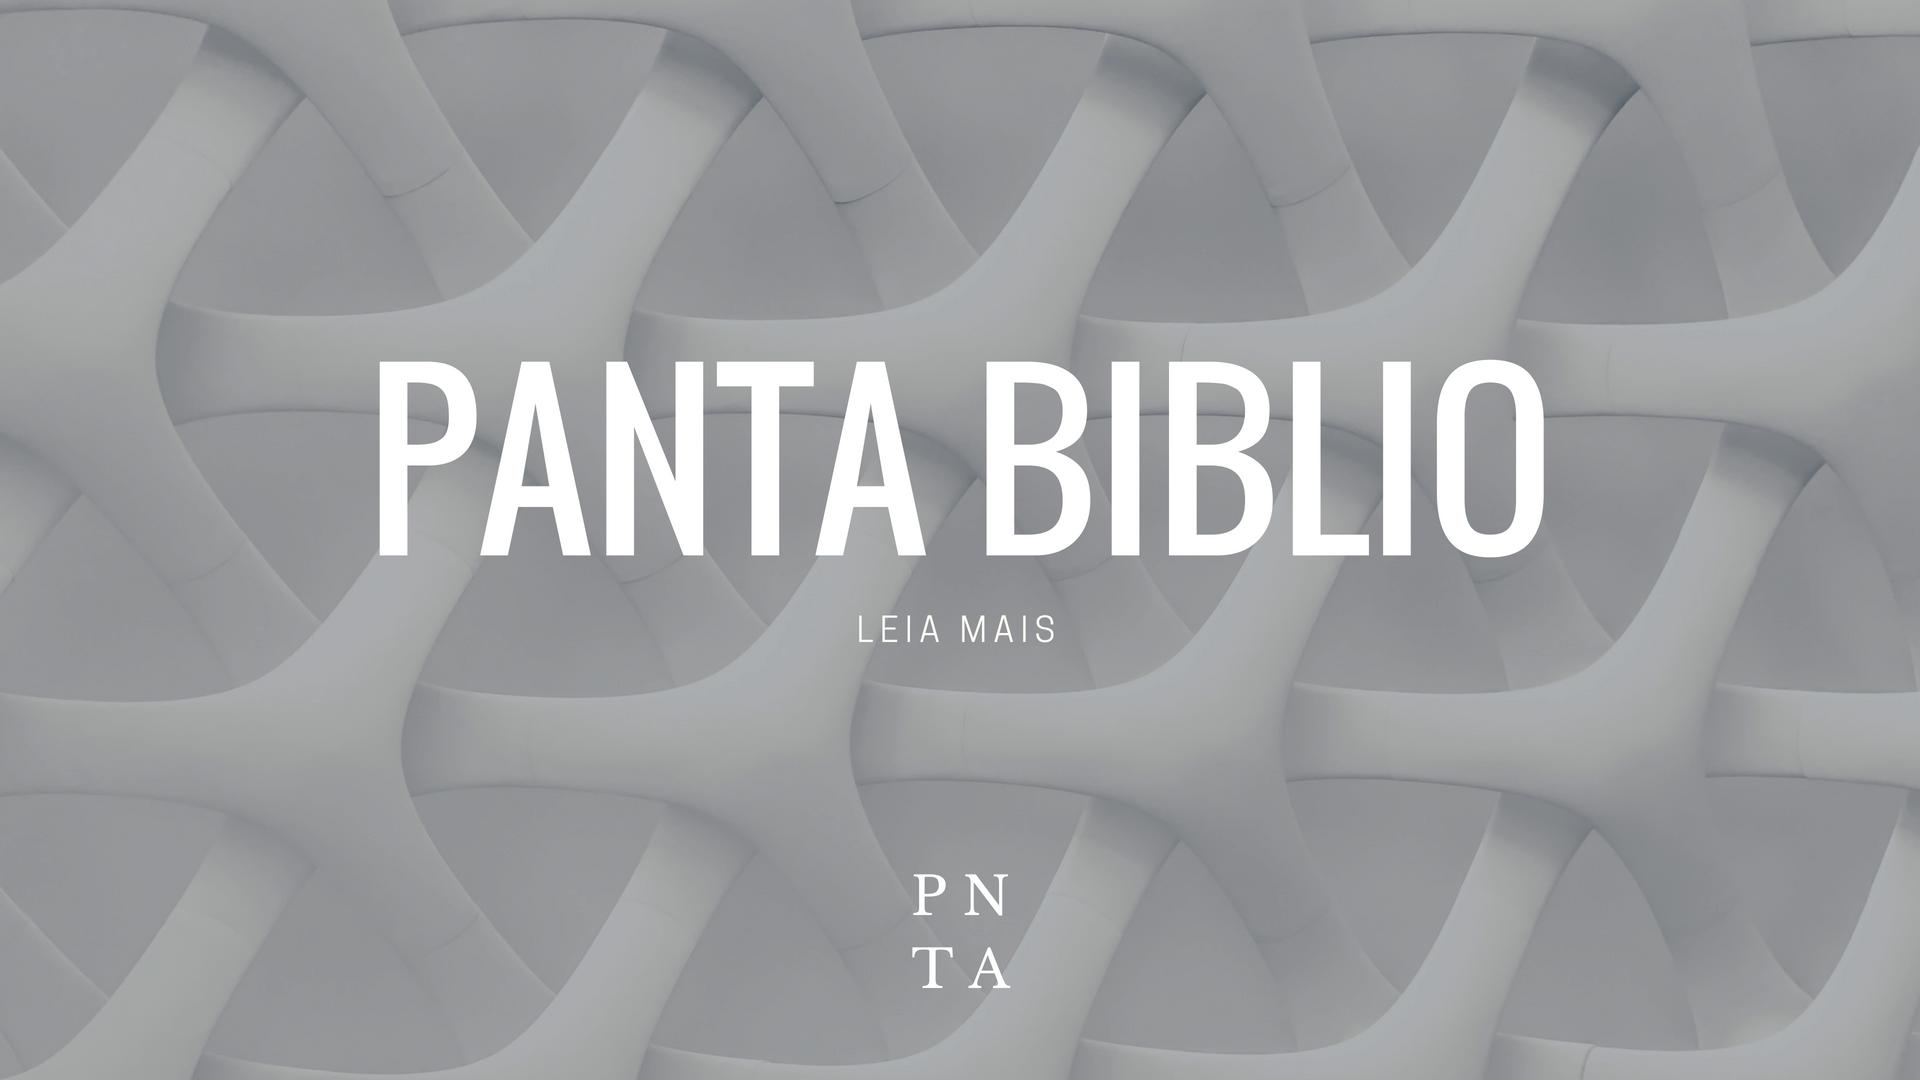 Pantabiblio - A biblioteca do Pantagruelista